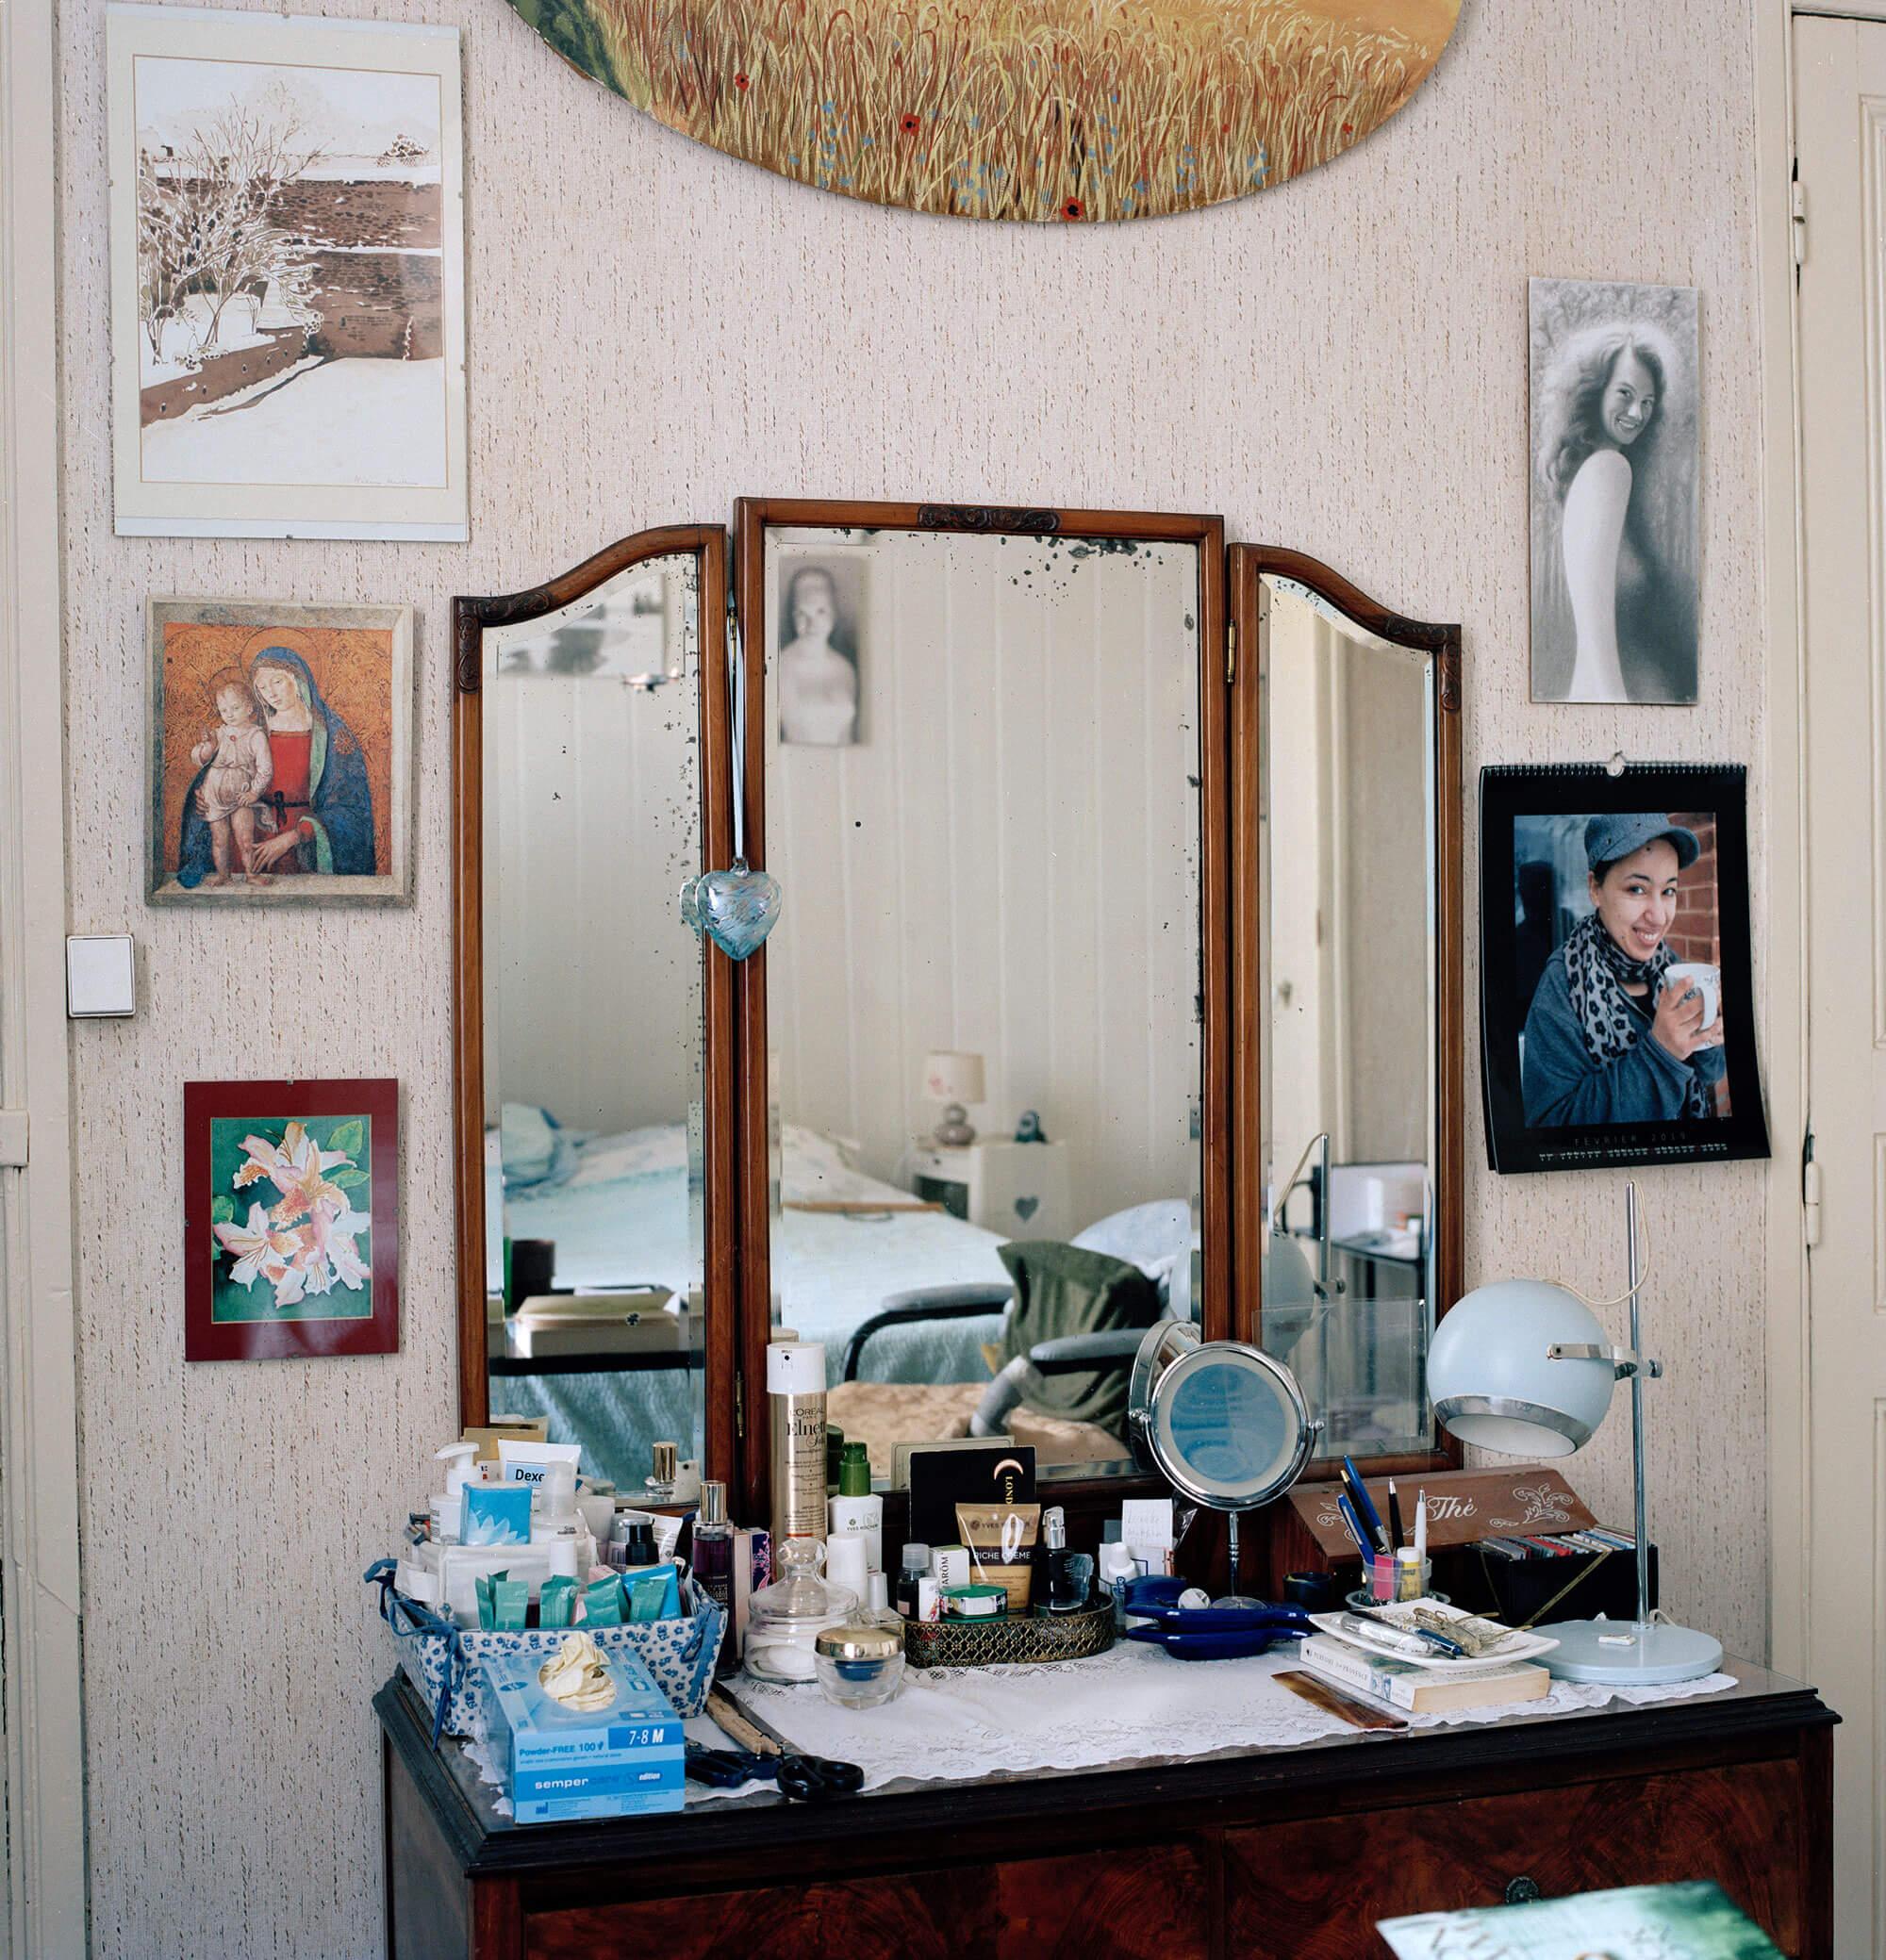 The South West Collective Maia Pavey Chez Moi De Loin photography photographer documentary kodak medium format film Nikon canon journalism document